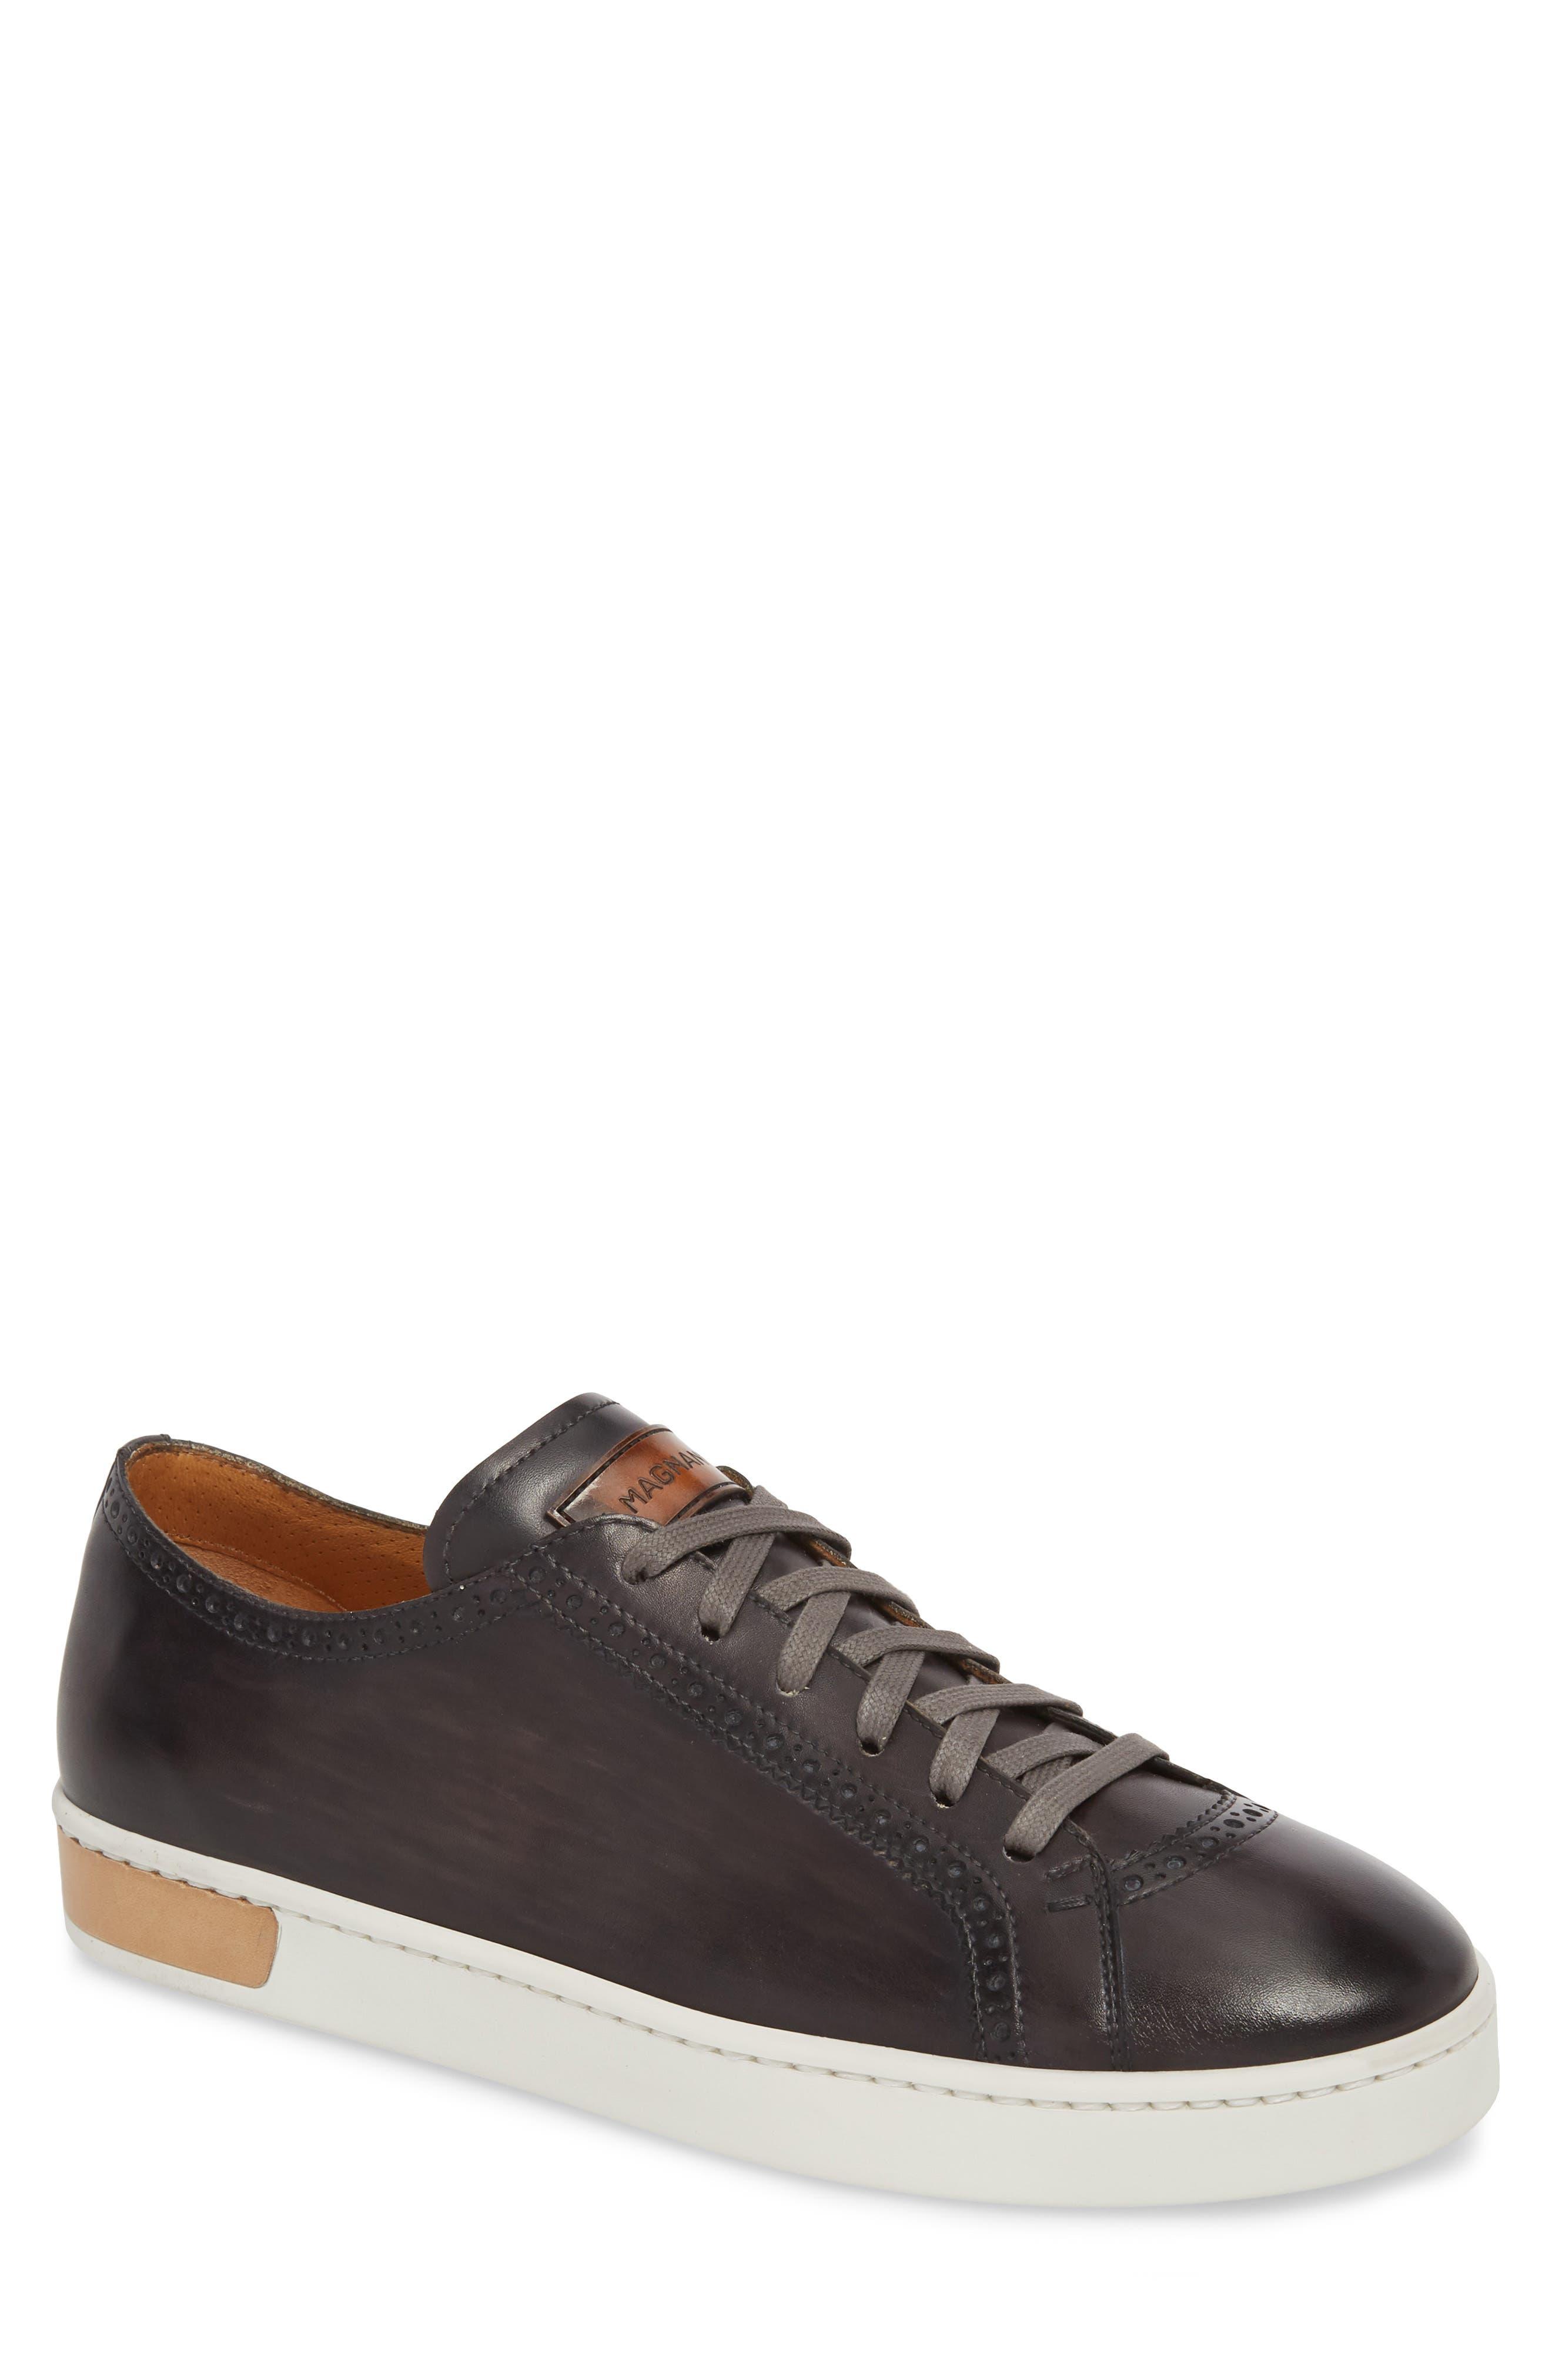 MAGNANNI,                             Juniper Brogued Low Top Sneaker,                             Main thumbnail 1, color,                             020